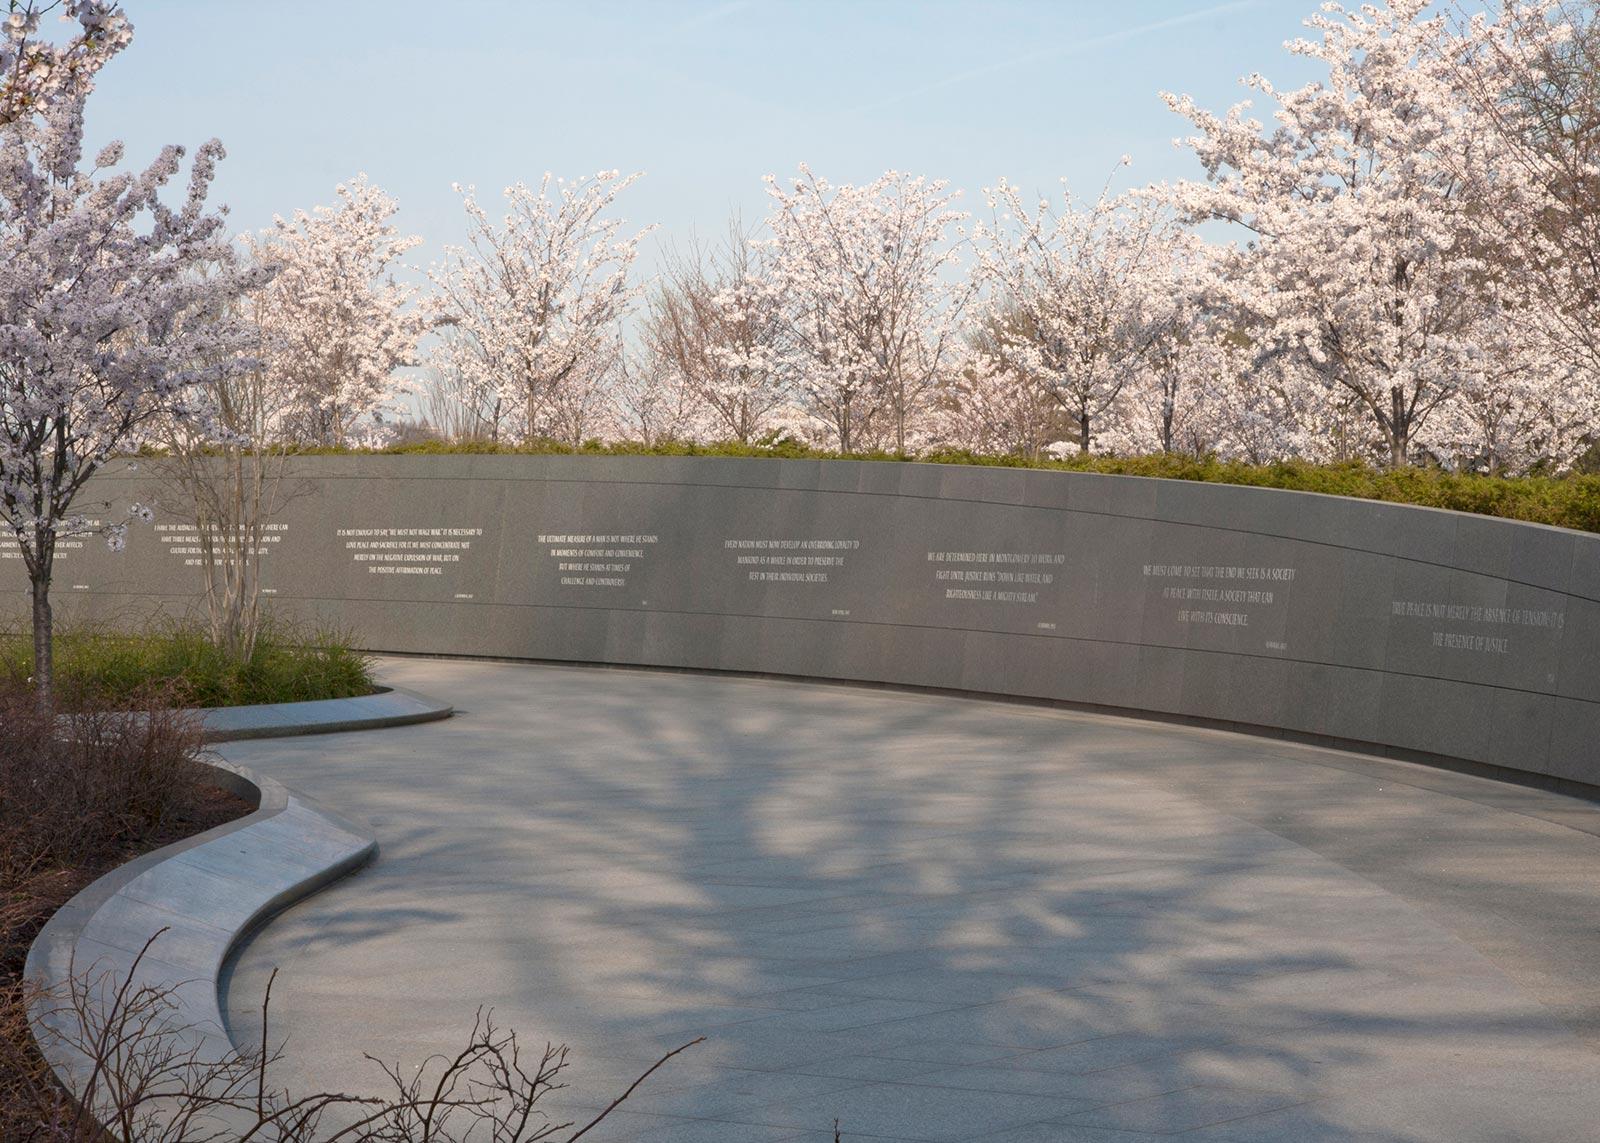 Martin Luther King, Jr. National Memorial 4